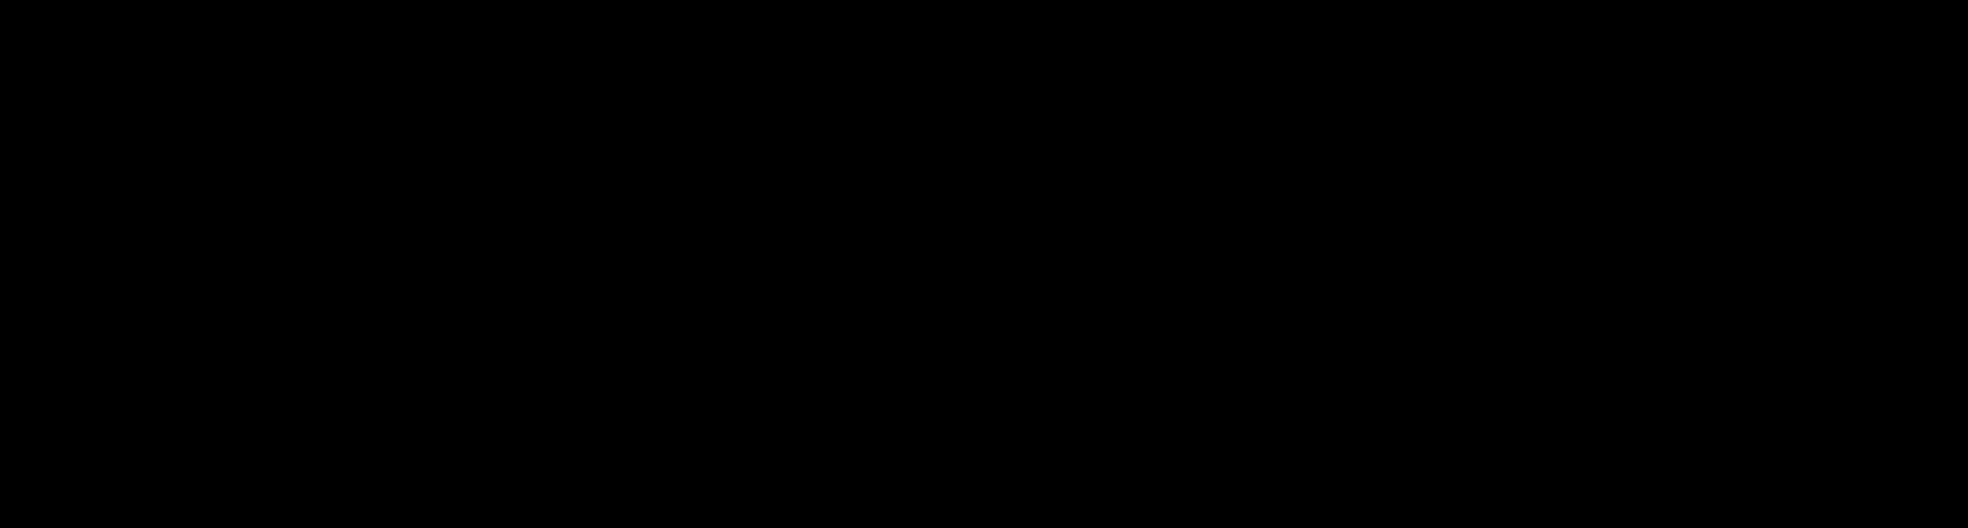 Aripiprazole impurity